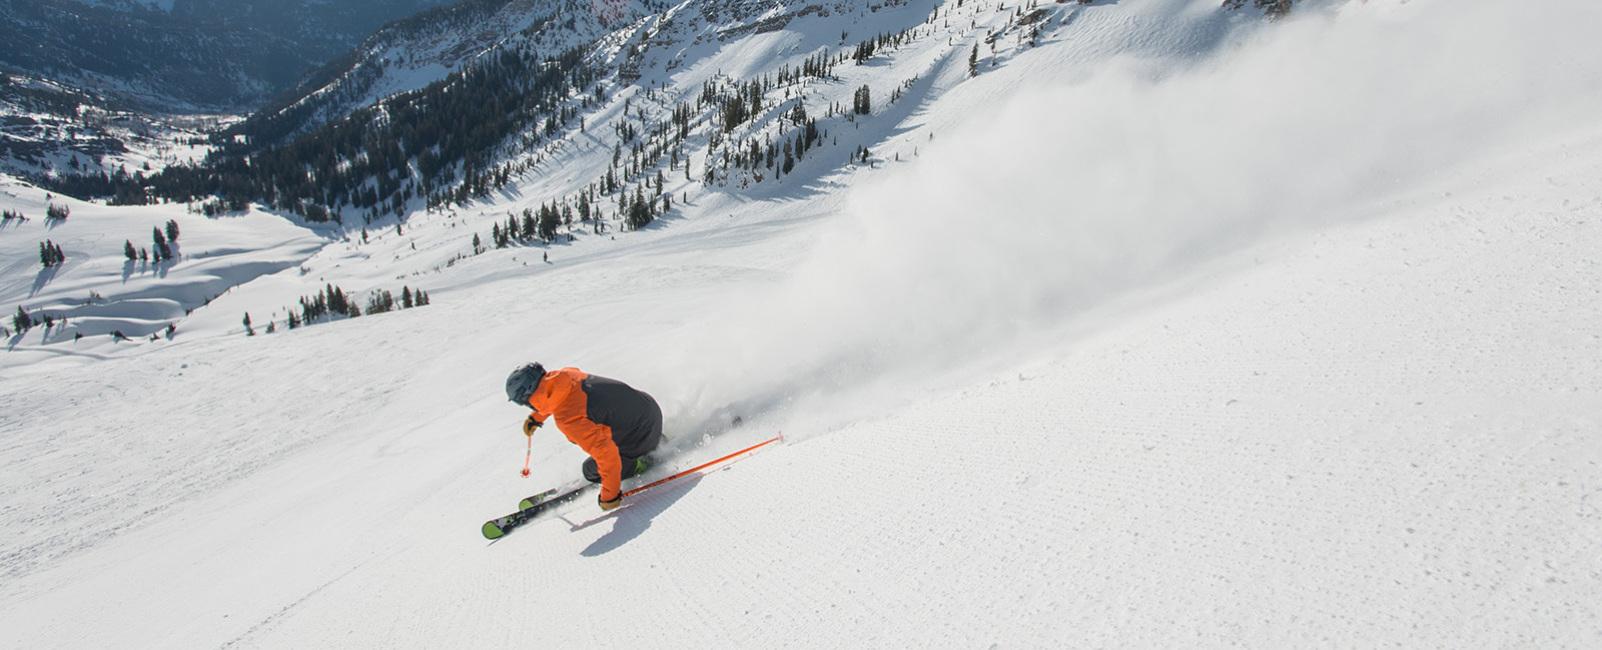 40+ Ways to Save on Your Utah Ski Vacation